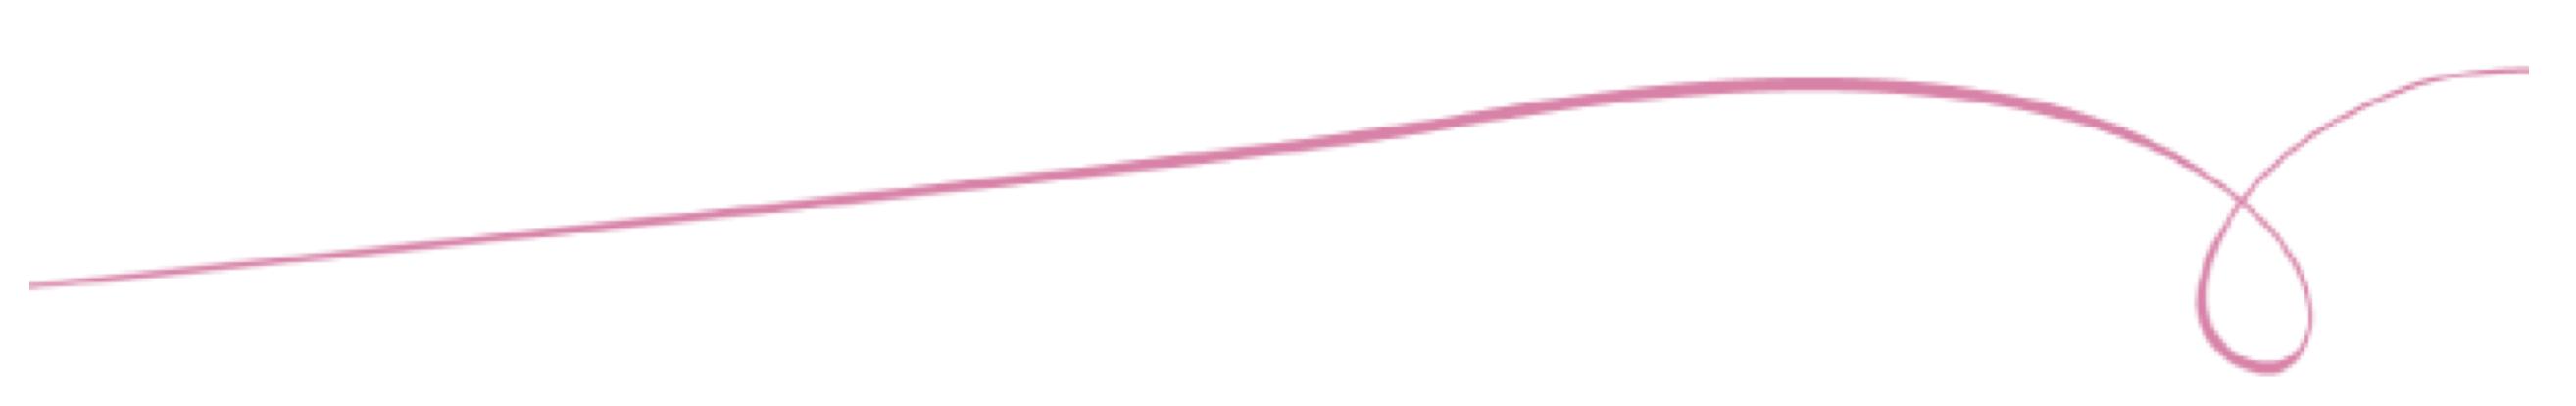 bottom pink ribbon graphic